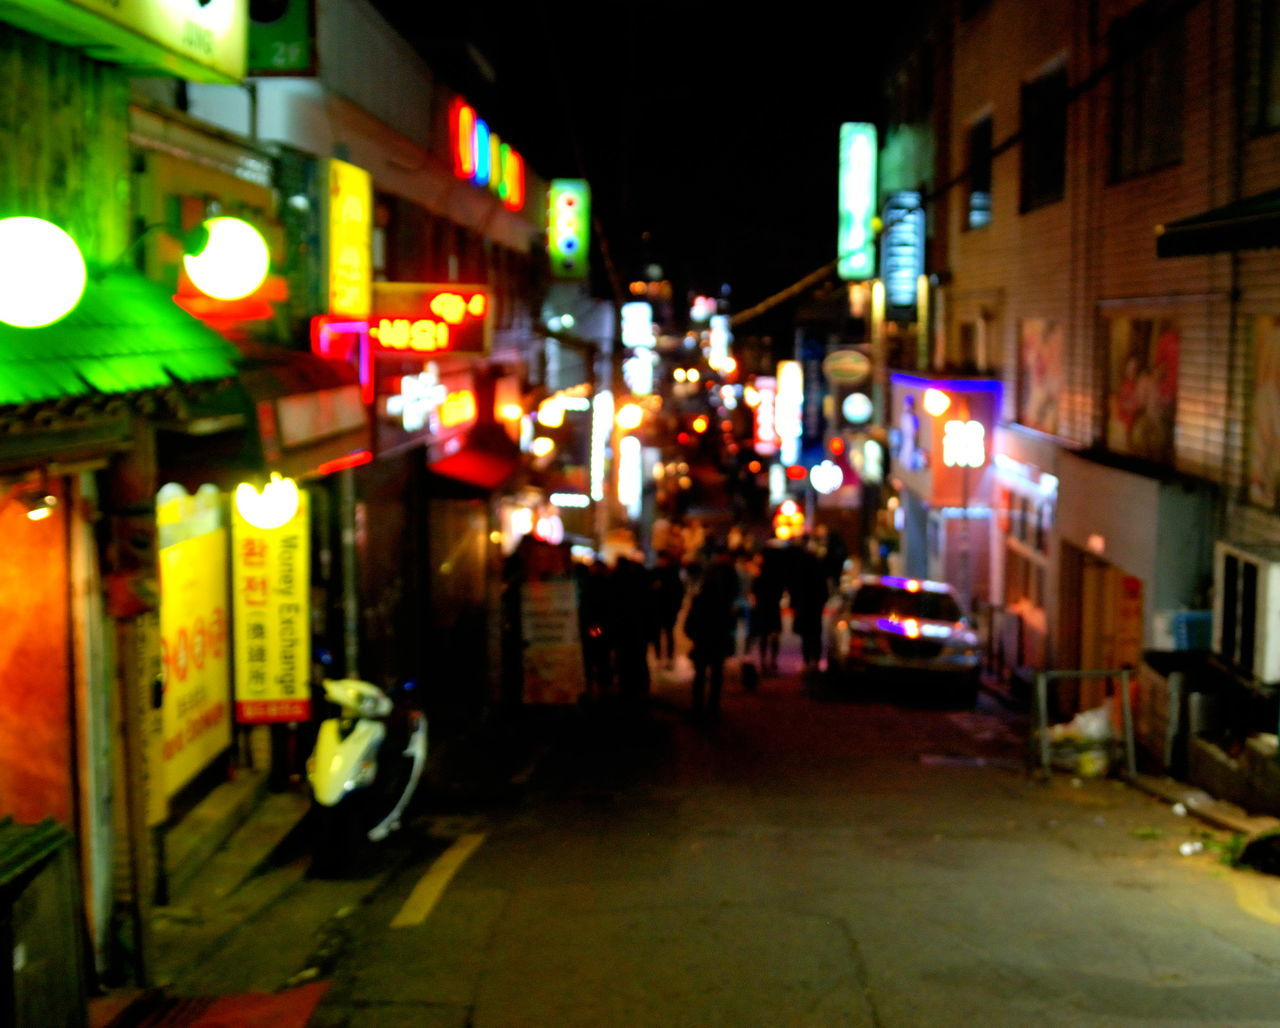 Blur Blurred Motion City Life City Street Day Life Iteawon Night Night Lights Night Photography Street Light Streetphotography